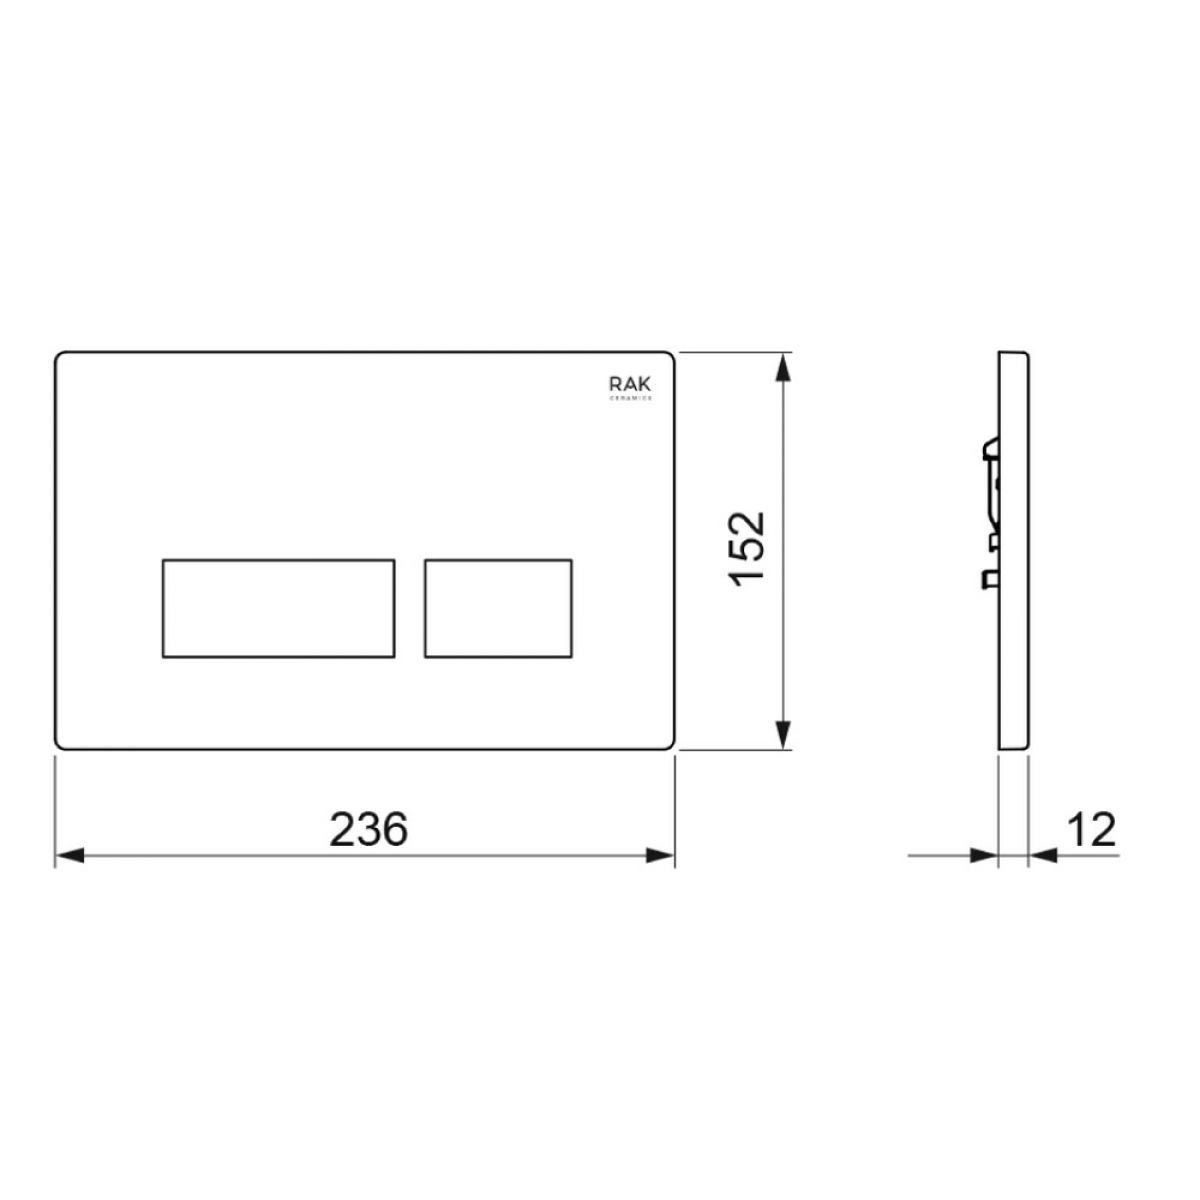 RAK Ecofix Matt Chrome Flush Plate with Rectangular Push Buttons Measurements